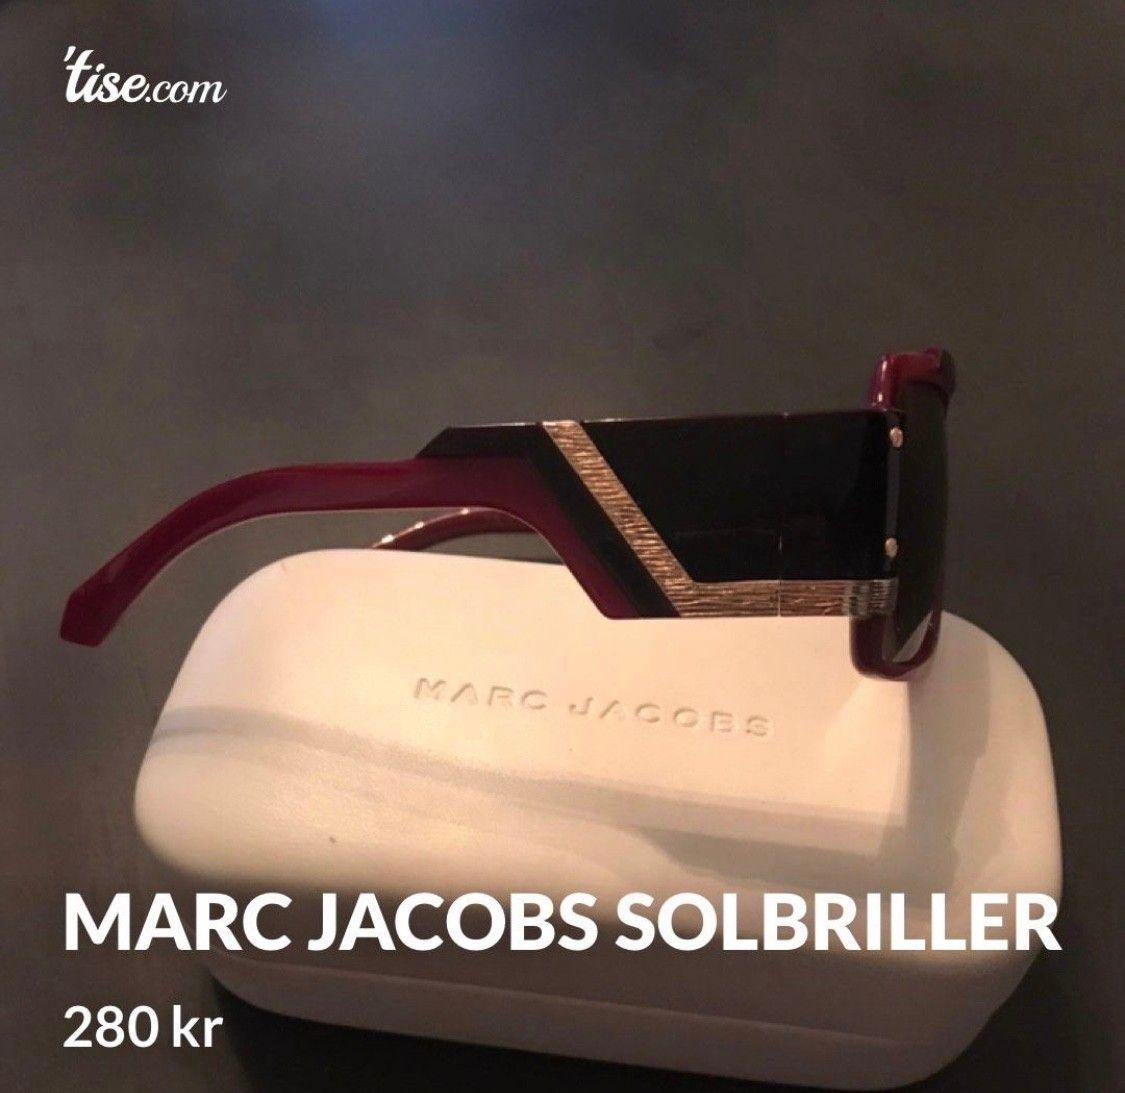 Marc jacobs solbriller selges | FINN.no